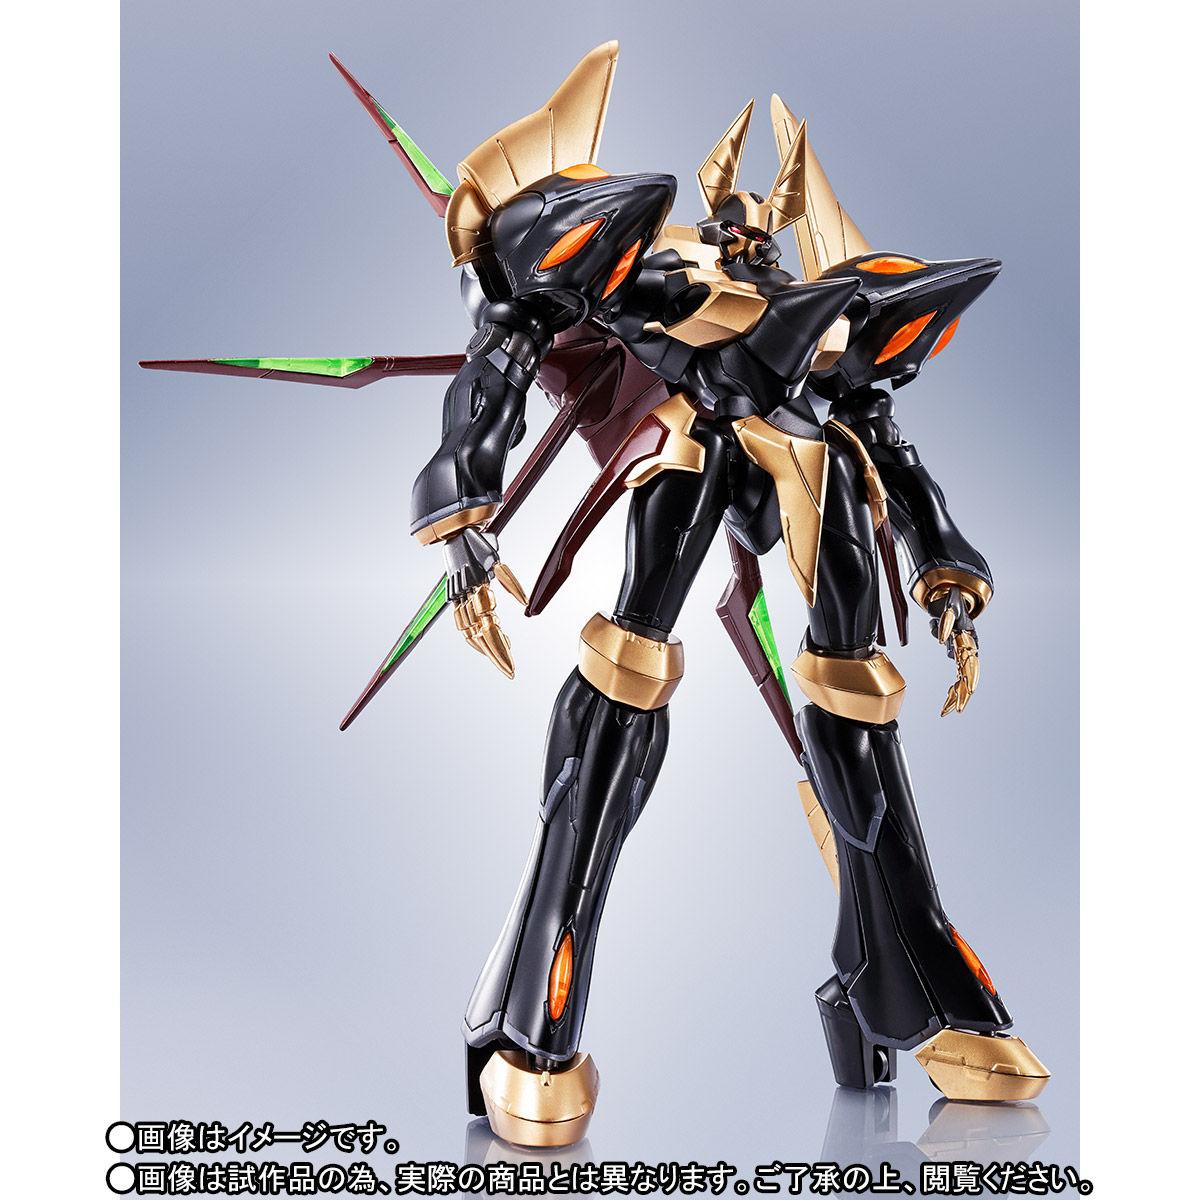 ROBOT魂〈SIDE KMF〉『ガウェイン ~BLACK REBELLION~』コードギアス 可動フィギュア-004